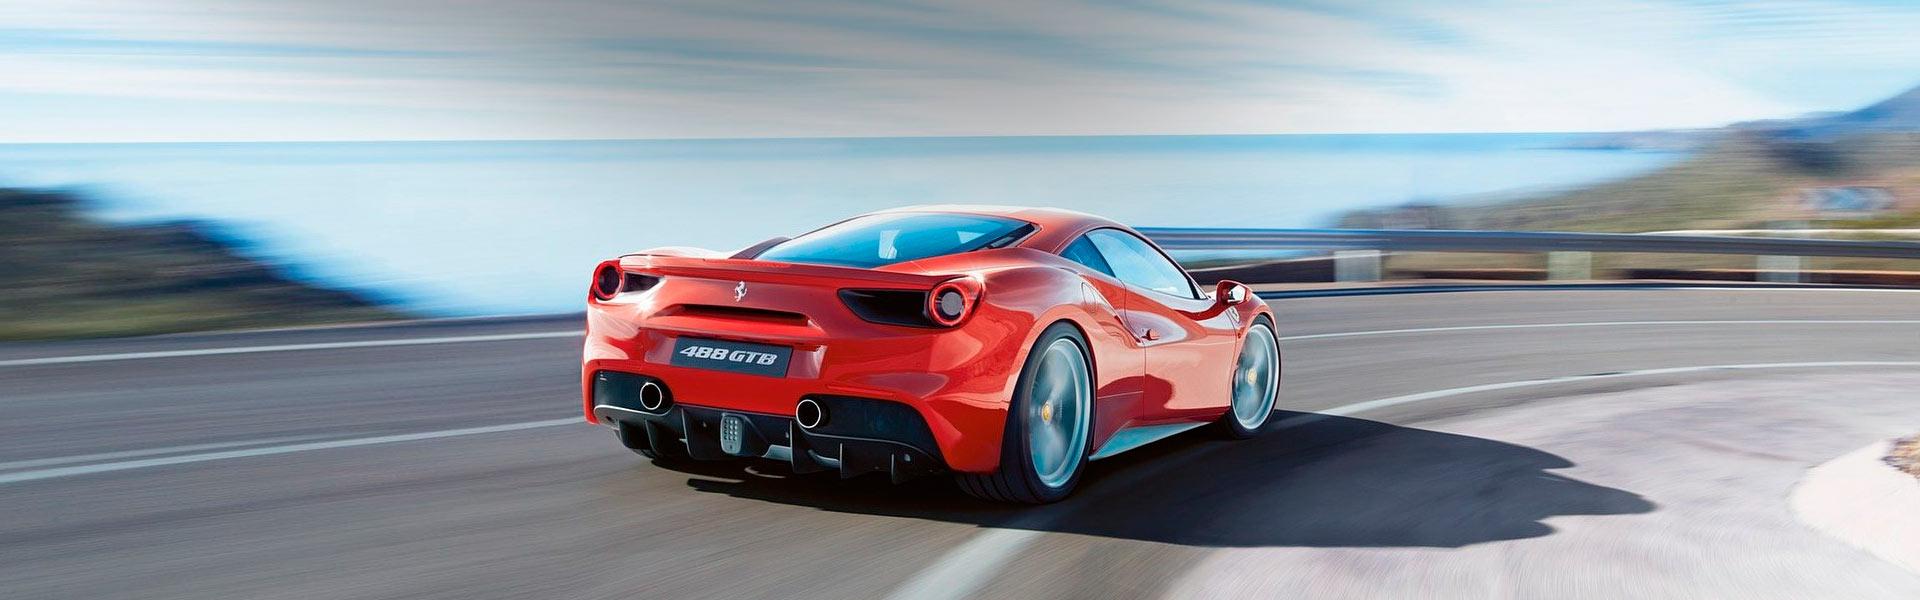 Замена лямда зонд Ferrari GTC4Lusso